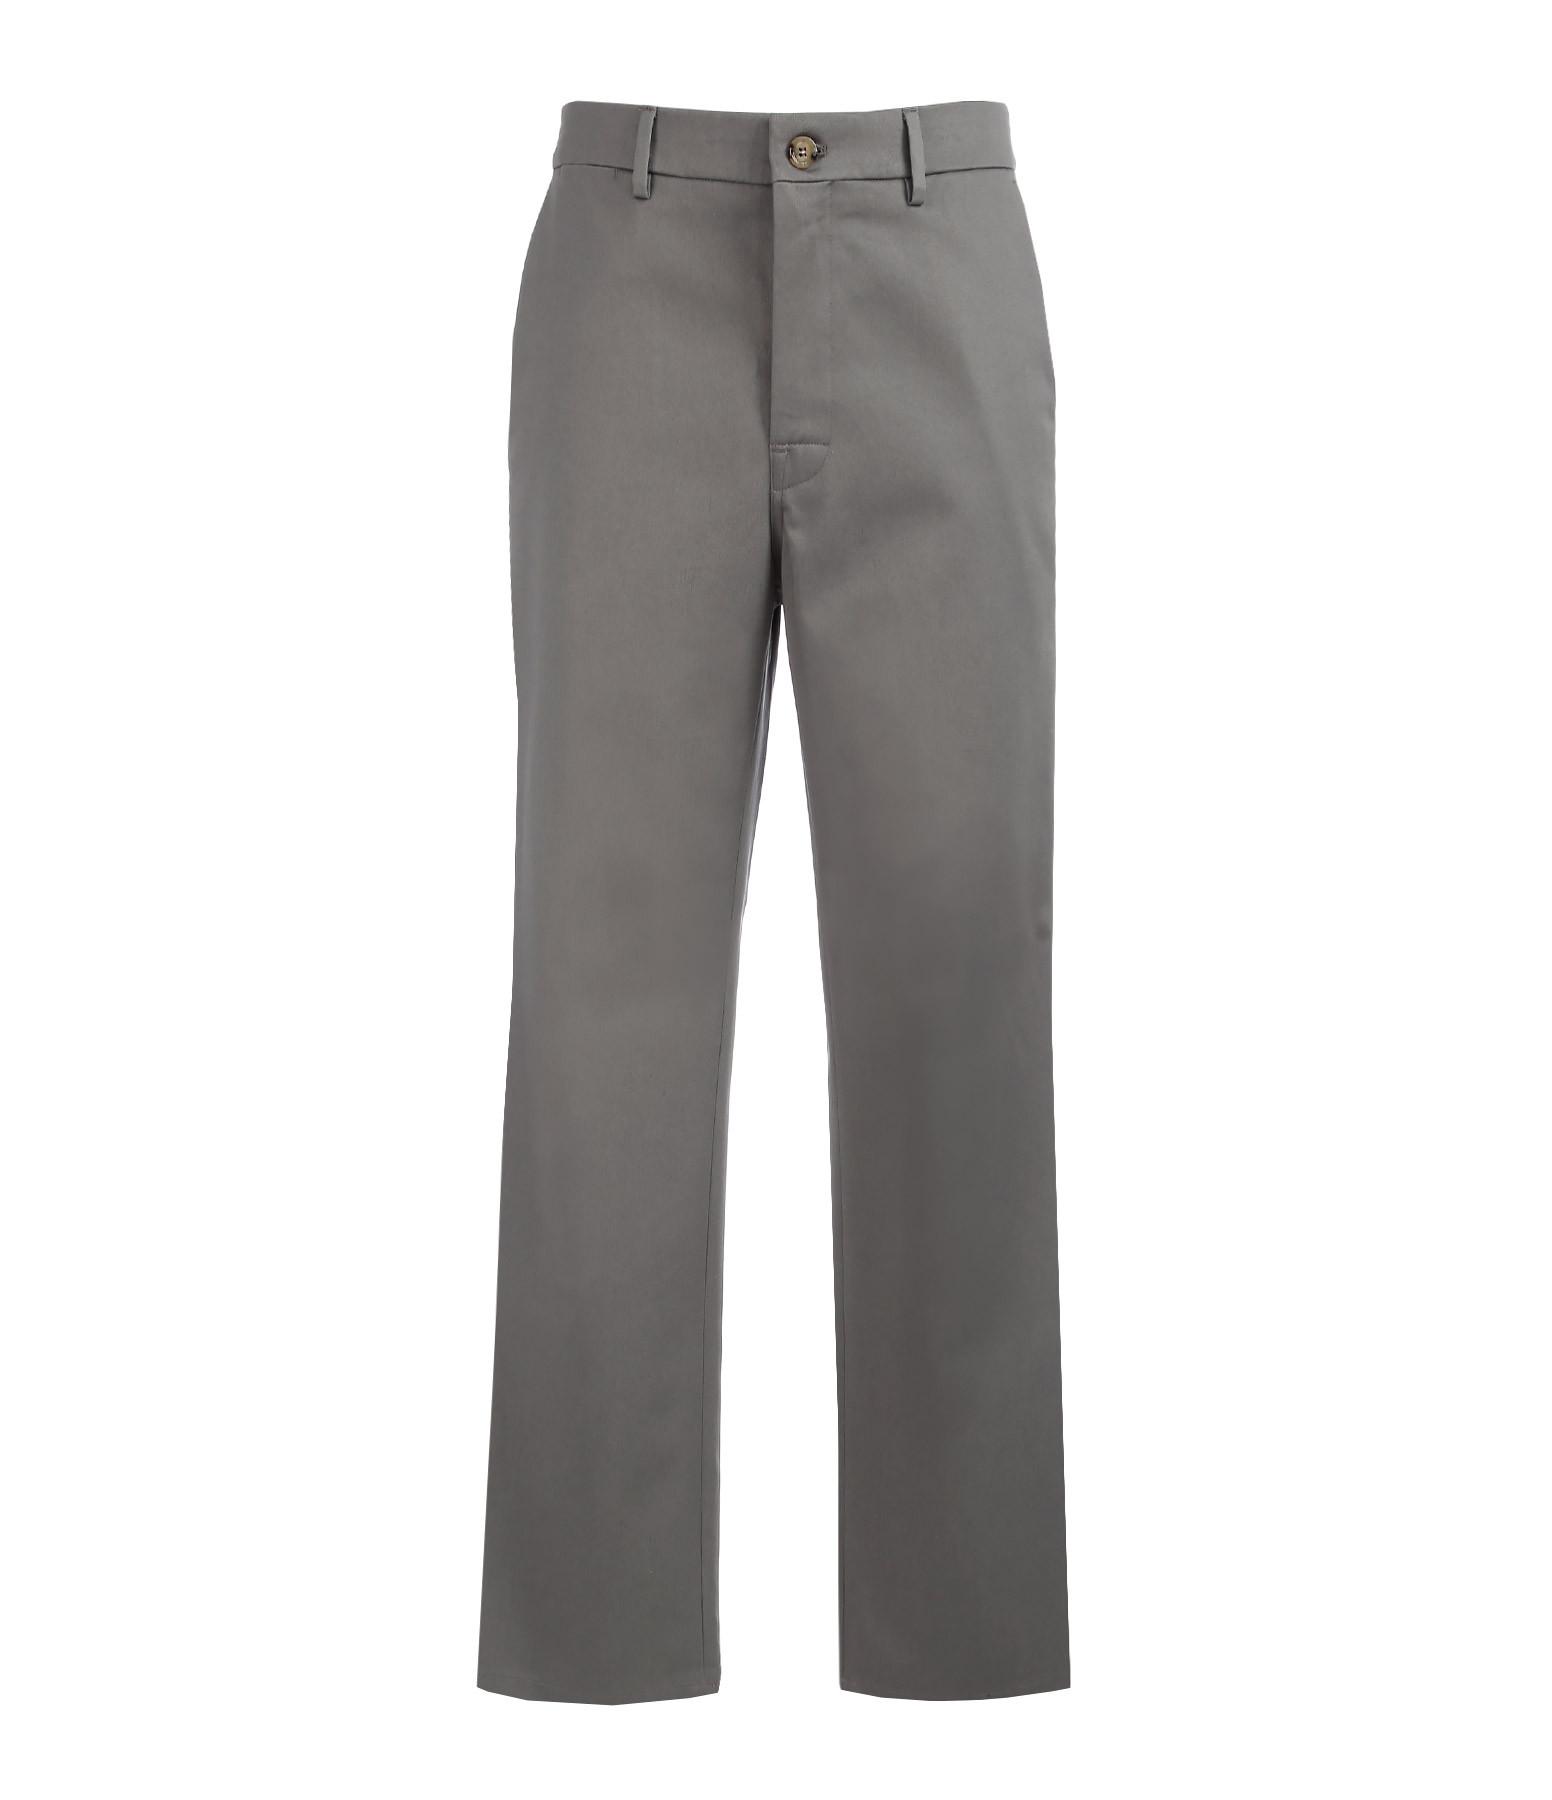 Pantalon Chino Homme Coton Gris - GOLDEN GOOSE